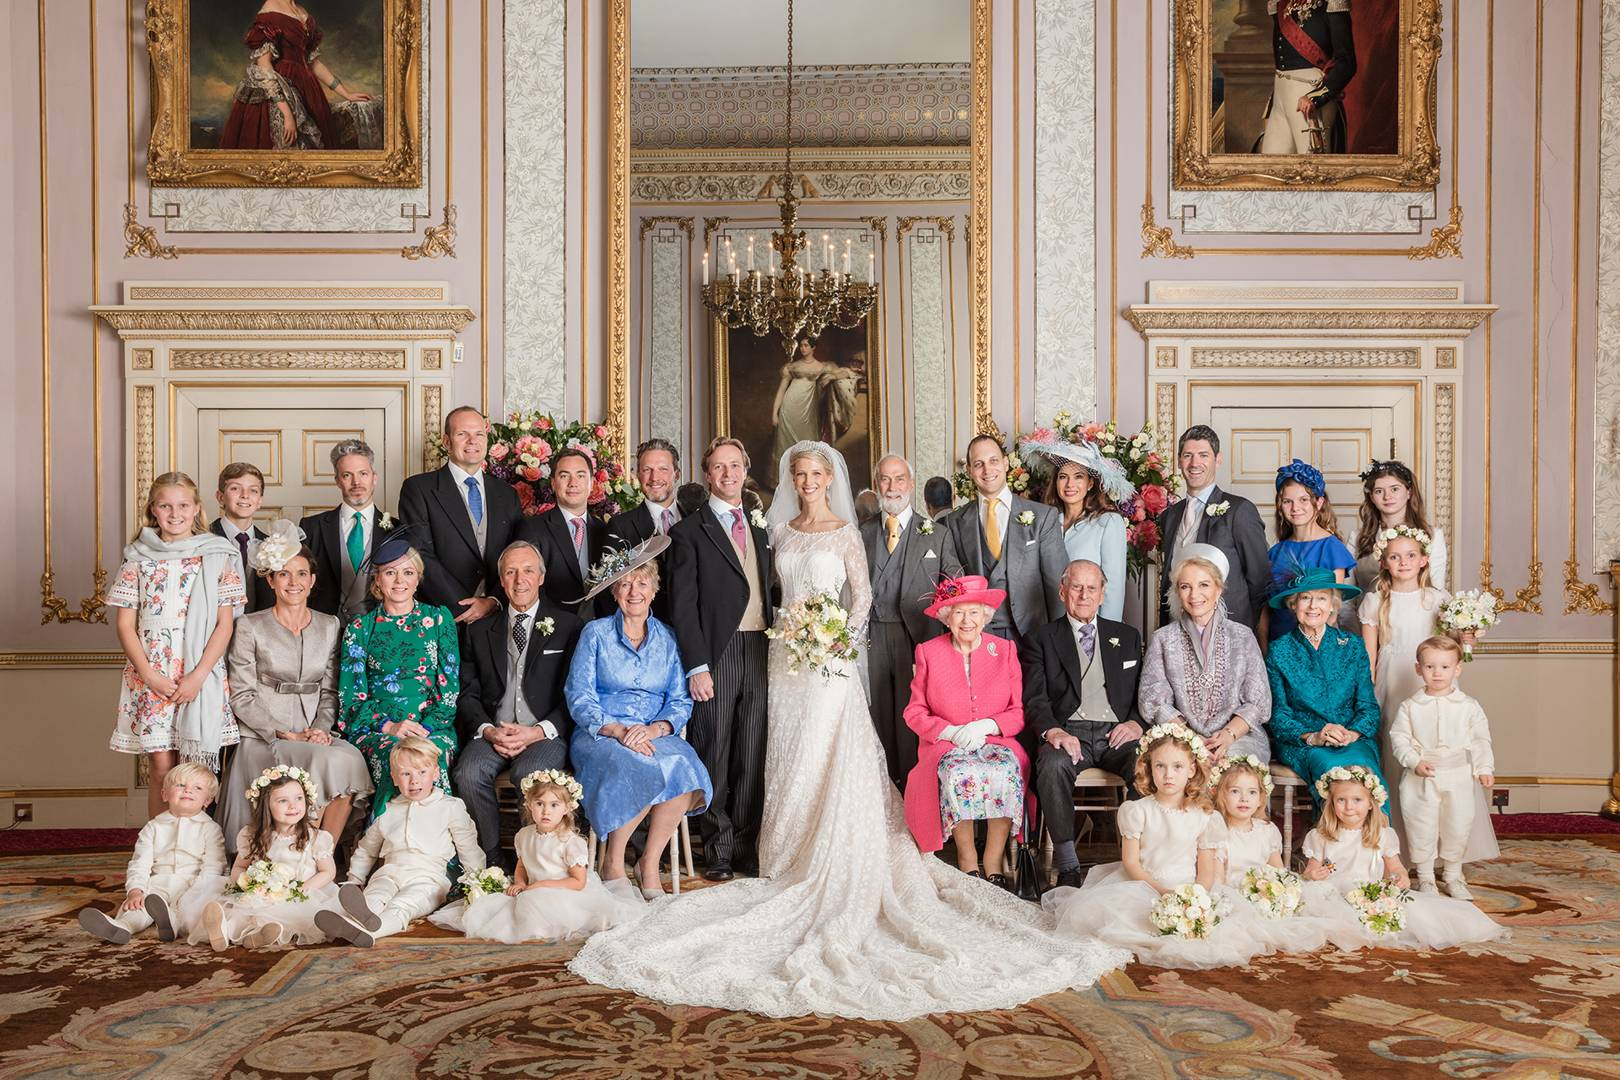 2019 in Royals